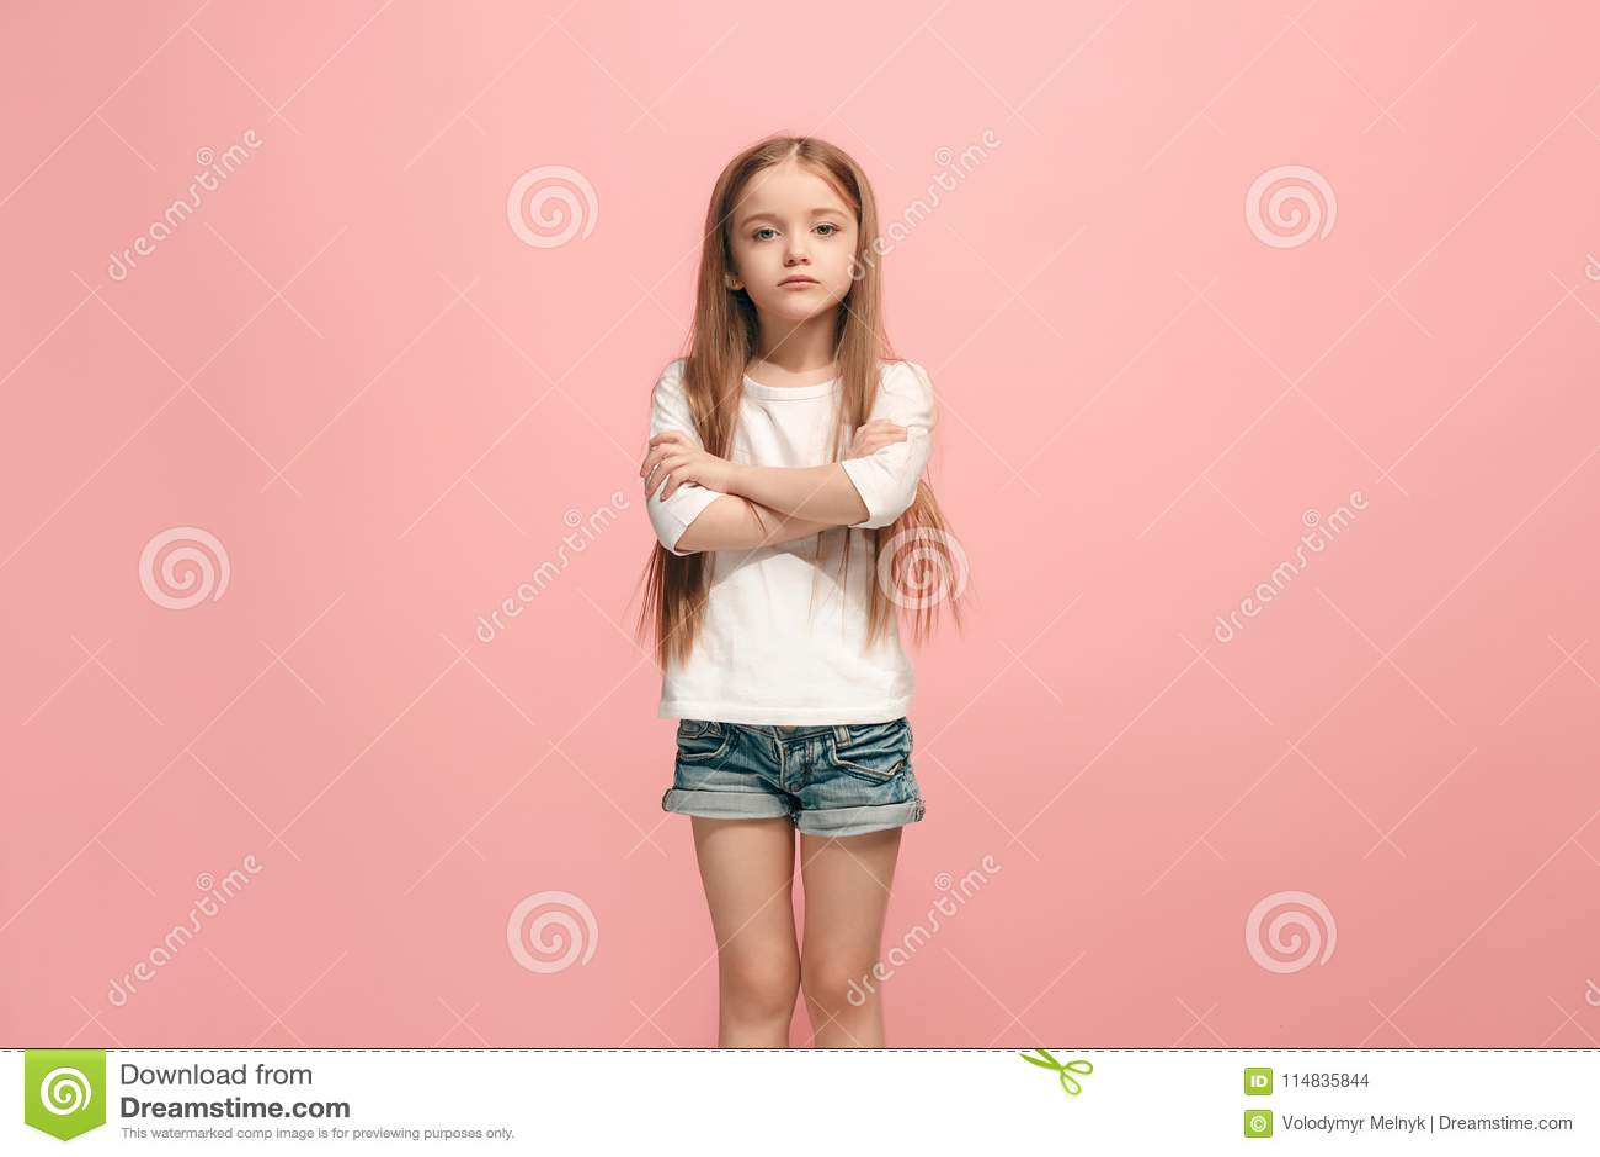 Shorts facial teen pictures